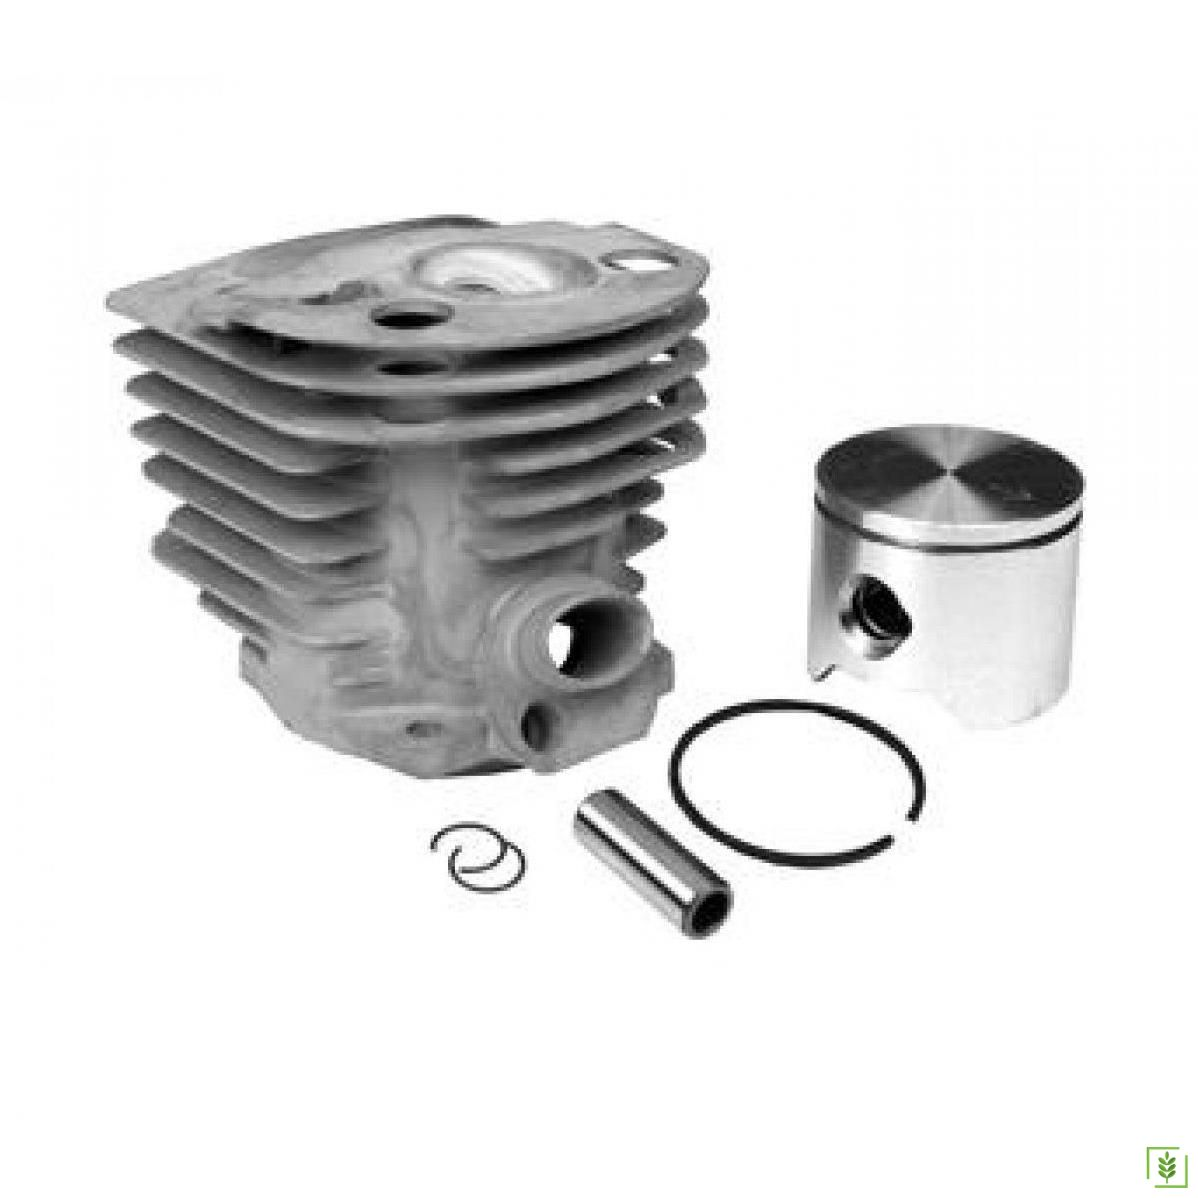 Husqvarna 55 Motorlu Testere Silindir Piston Seti 46 mm